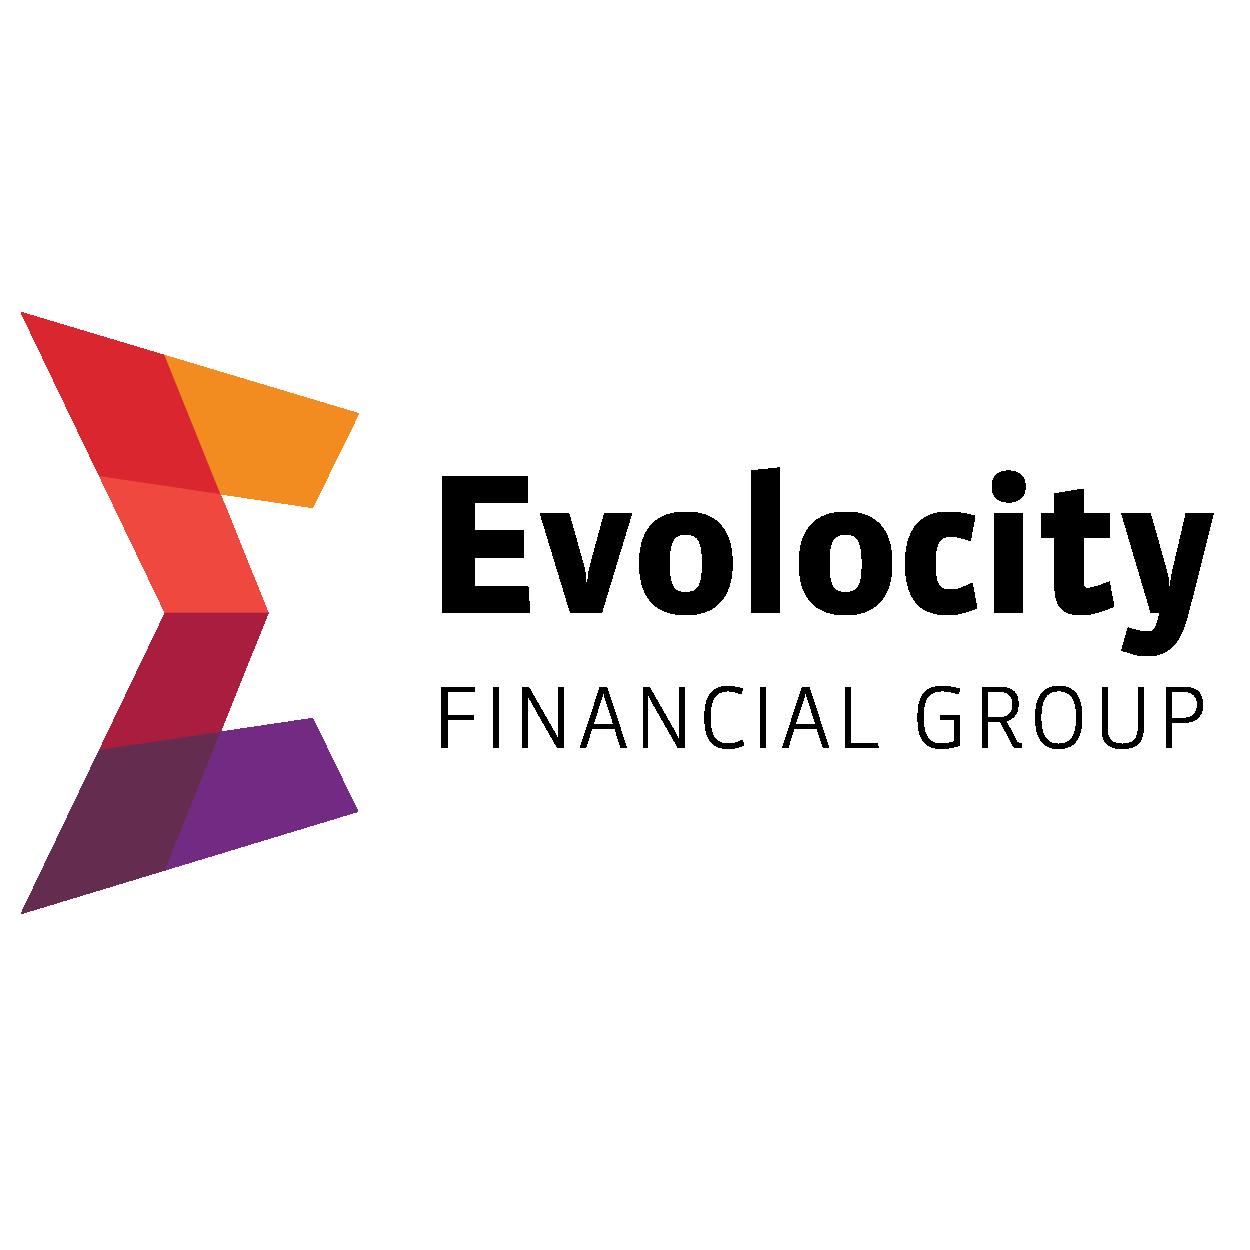 https://www.lightspeedhq.com/wp-content/uploads/2016/05/Evolocity-Logo-300x300-px-02.png